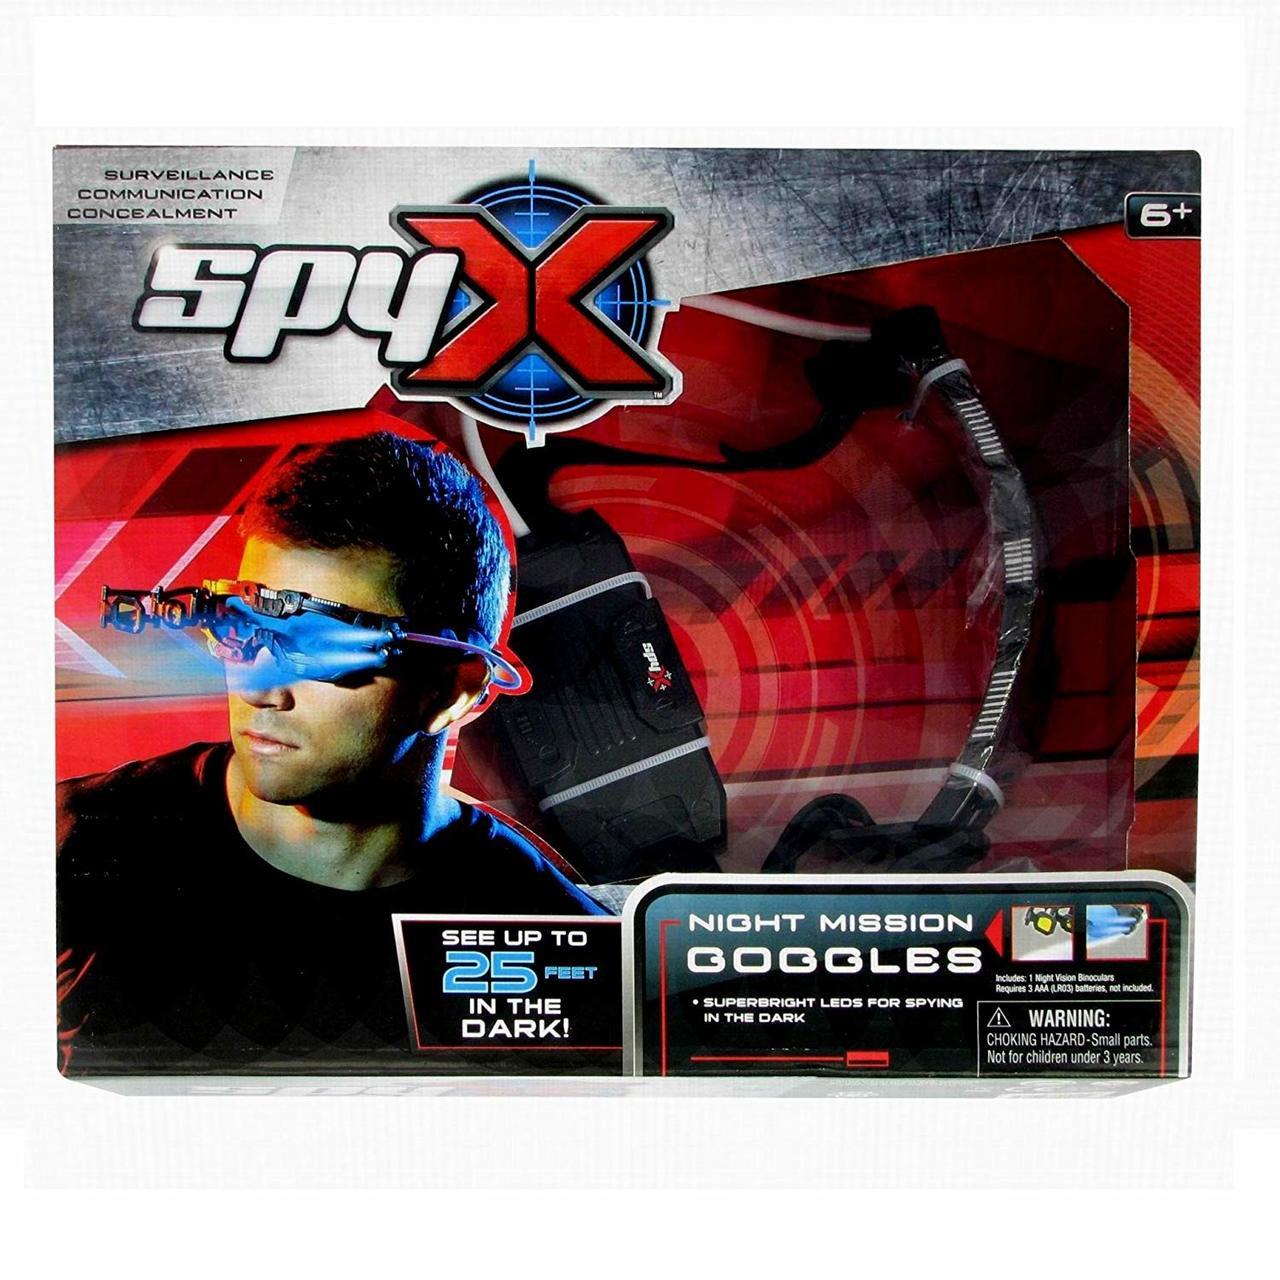 68bf9785240fc Spy X Night Mission Goggles - International Spy Museum Store